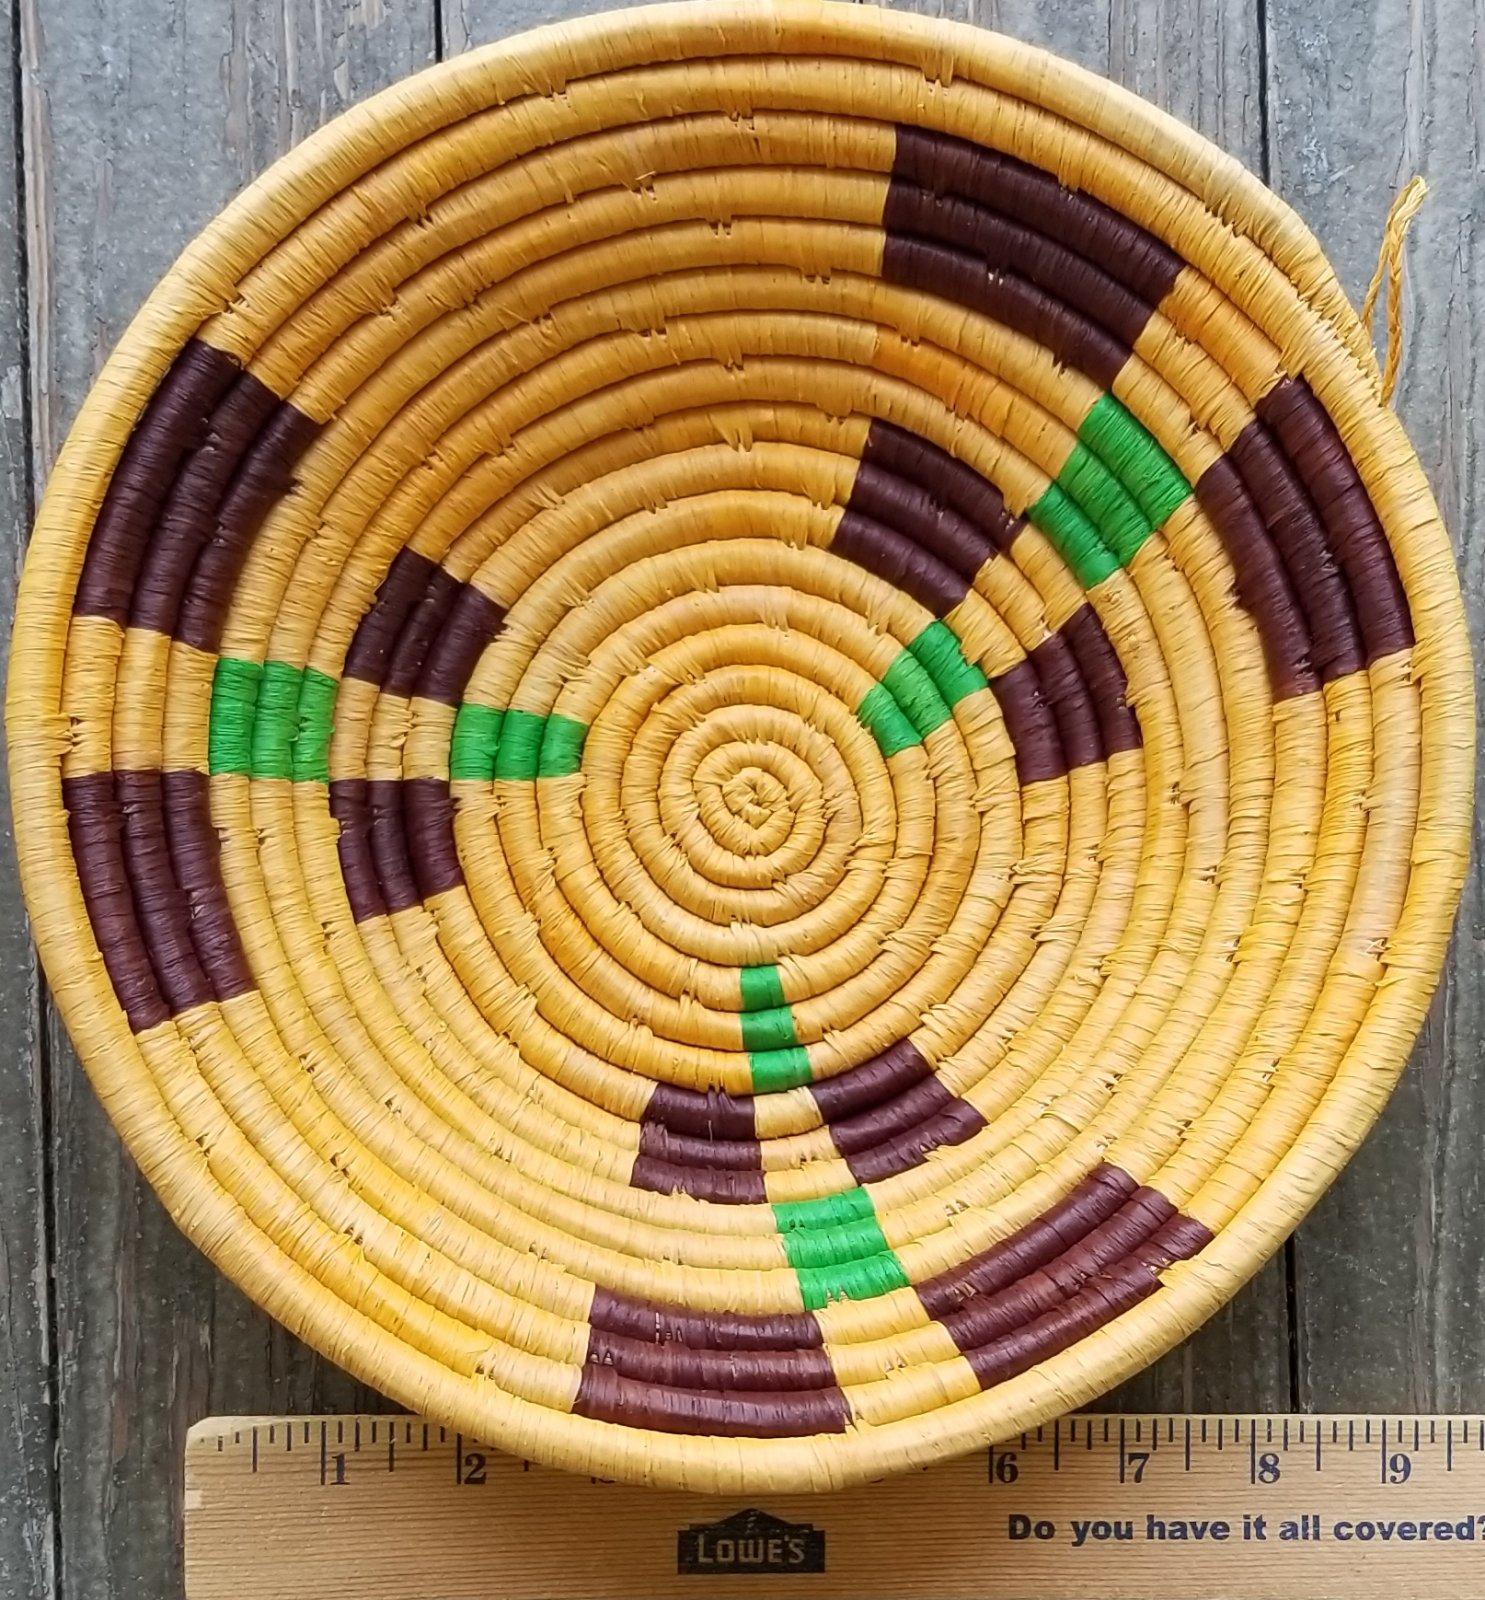 10 Uganda Basket with Brown and Green Squares #015